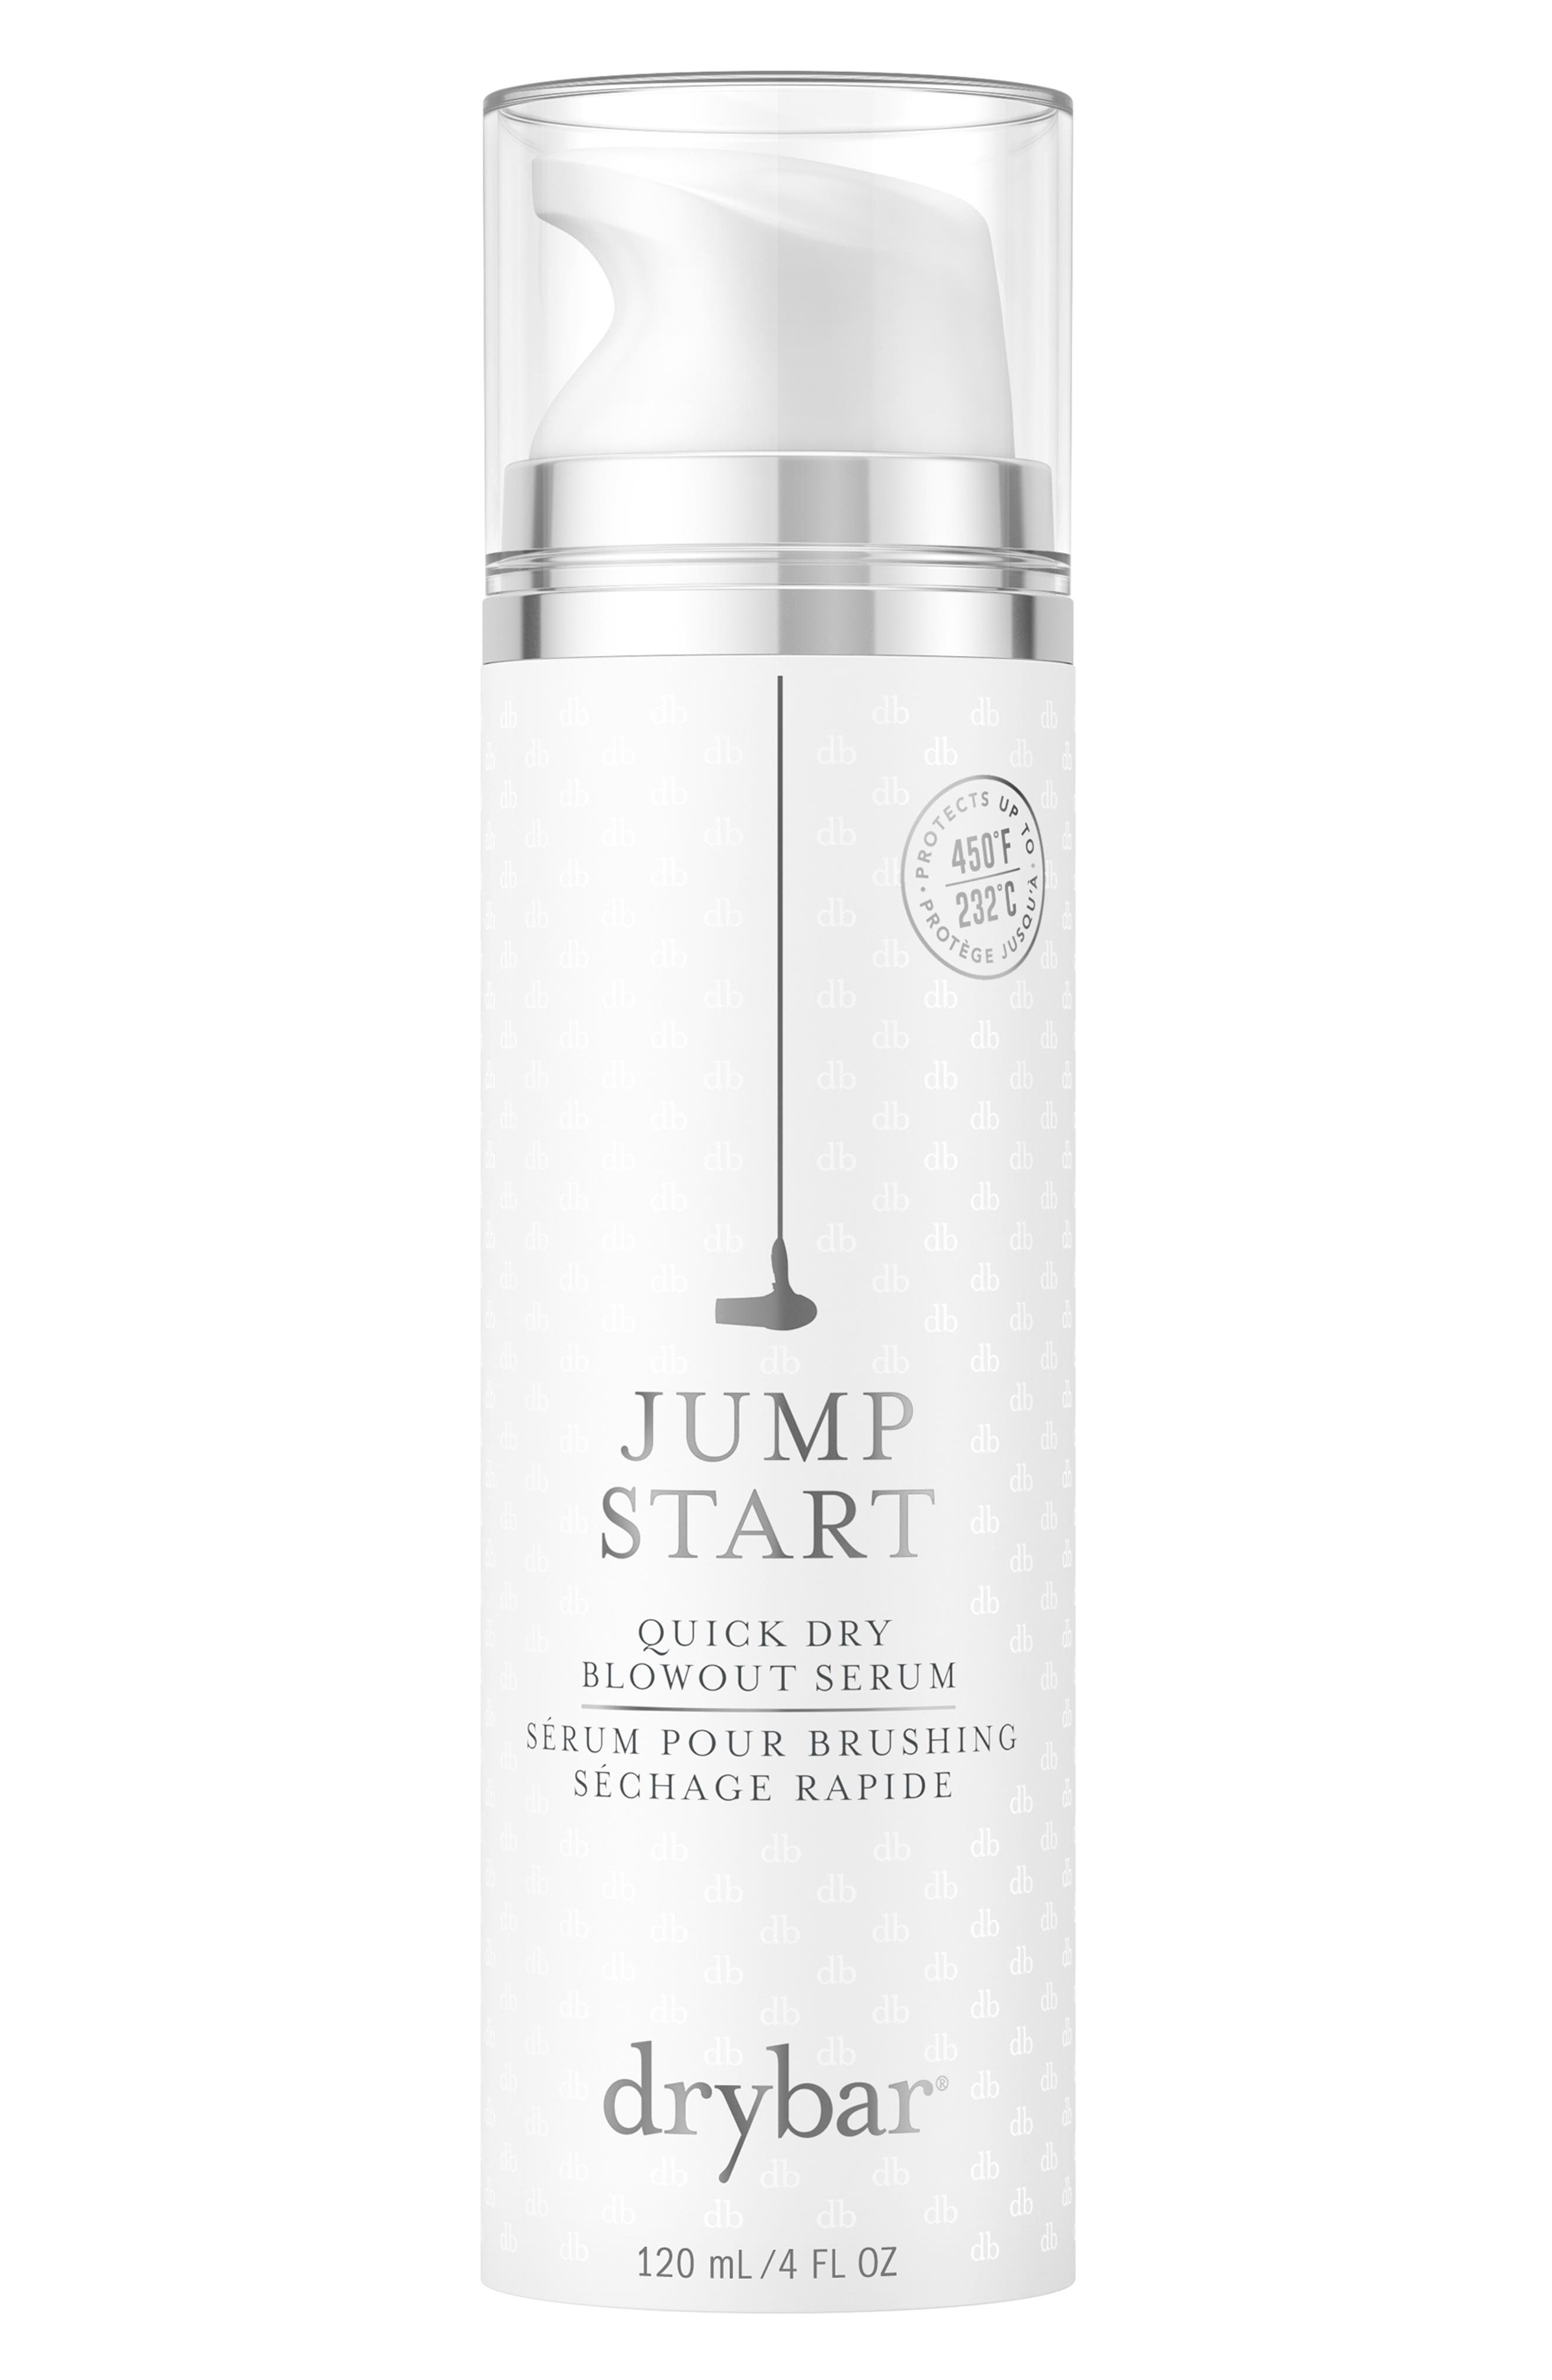 Jump Start Quick Dry Blowout Serum